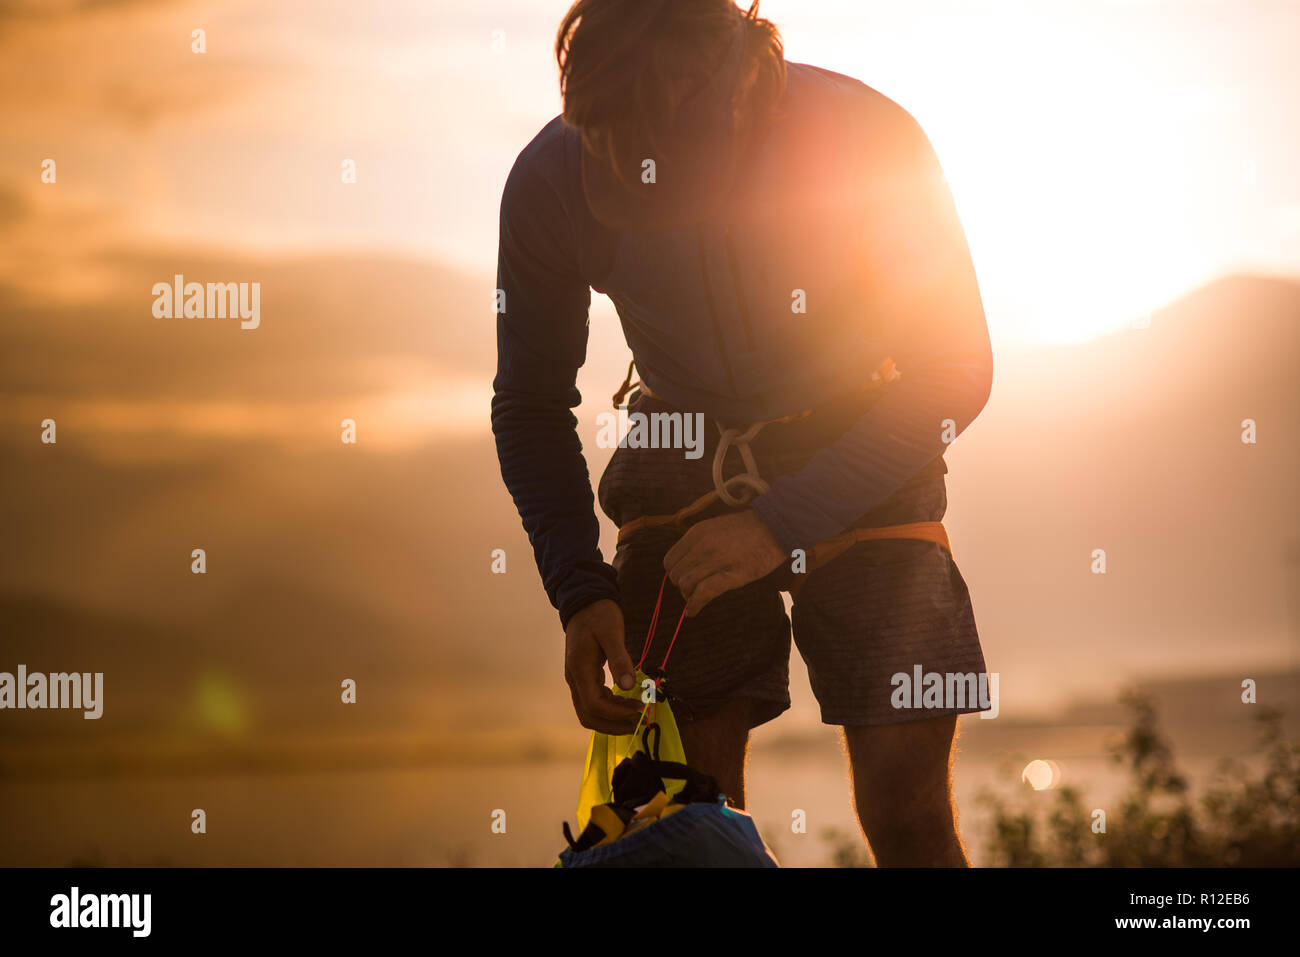 Man on rock climbing trip, Squamish, Canada - Stock Image